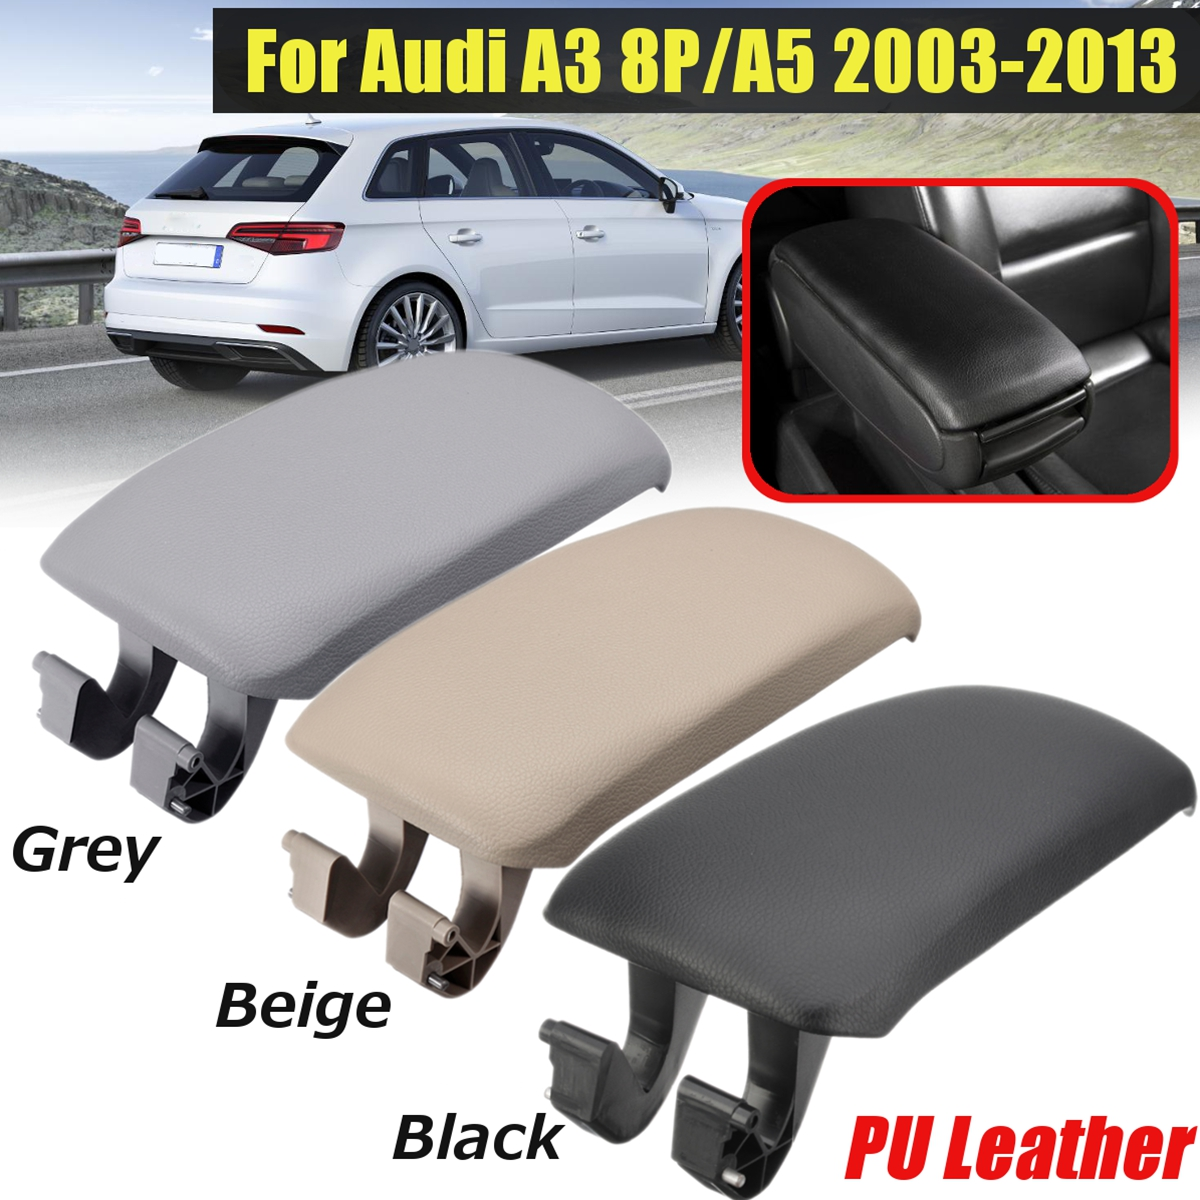 Pu Leather Center Console Arm Rest Storage Box Lid Cover Armrest Latch cover Car Pad For Audi A3 8P A5 2003-2012 8P0864245P